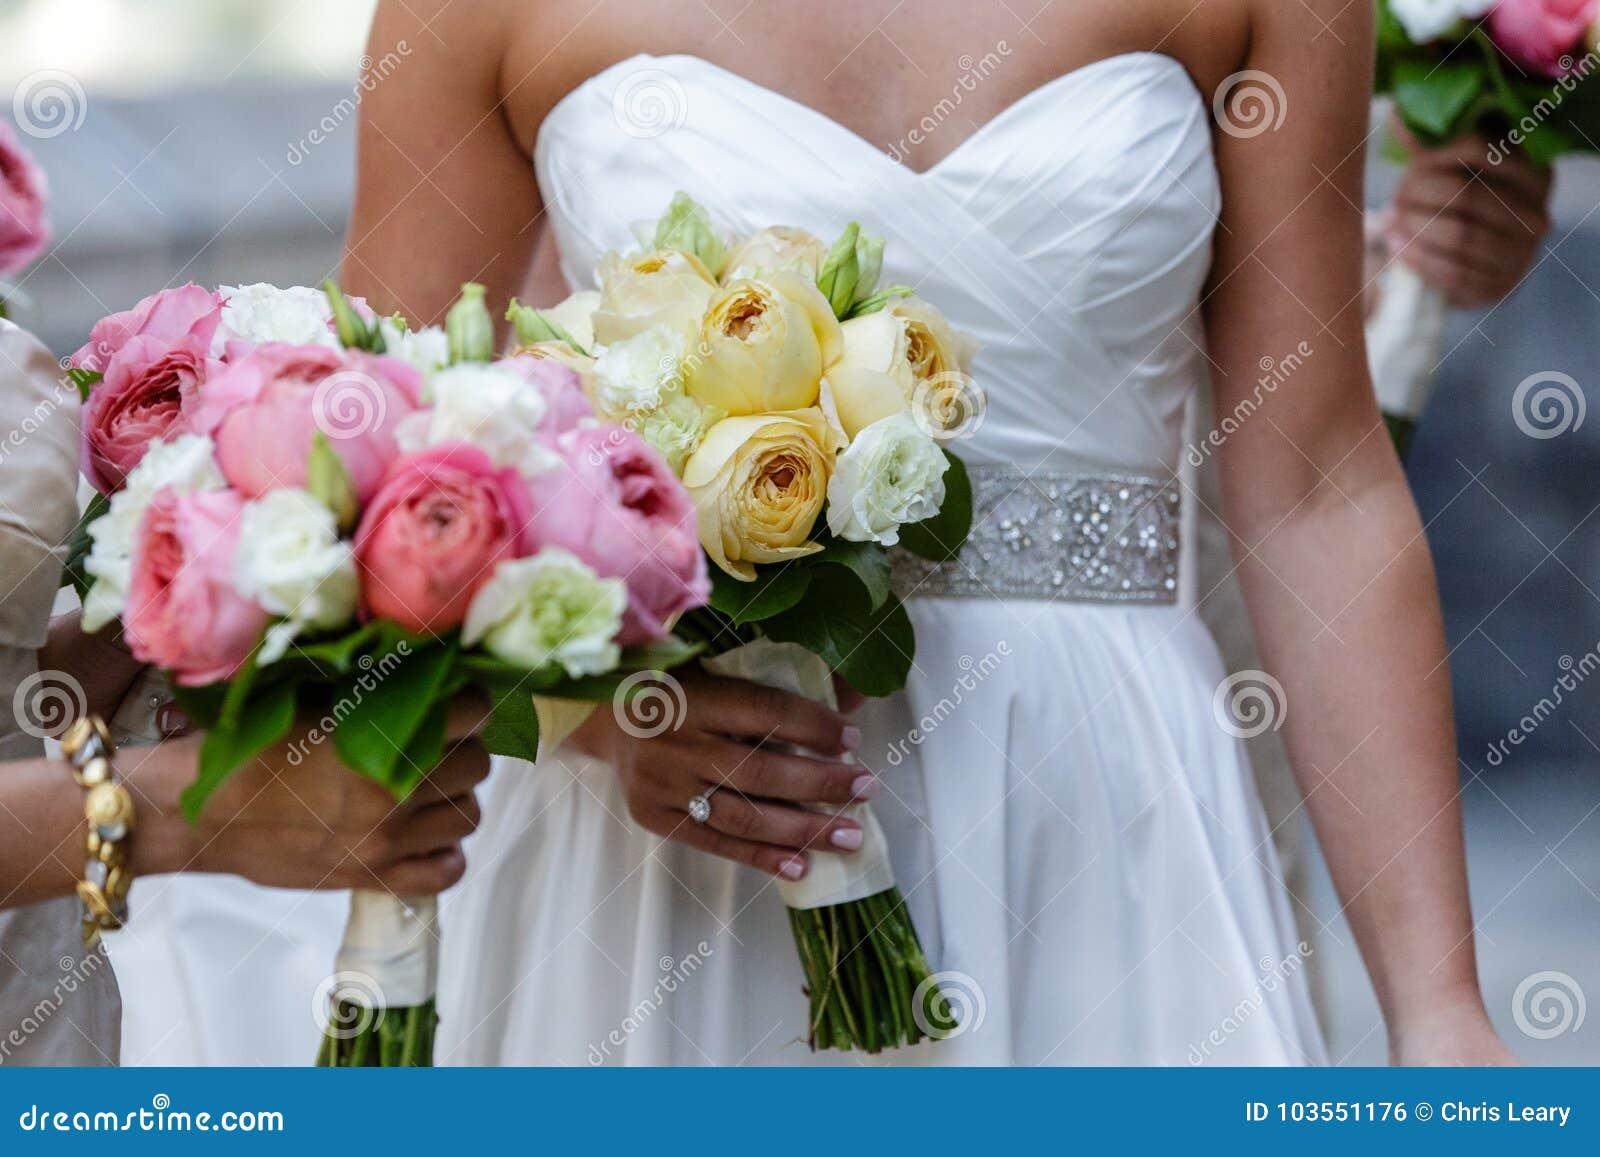 Bride Bridesmaid Holding Wedding Flower Bouquet Stock Photo Image